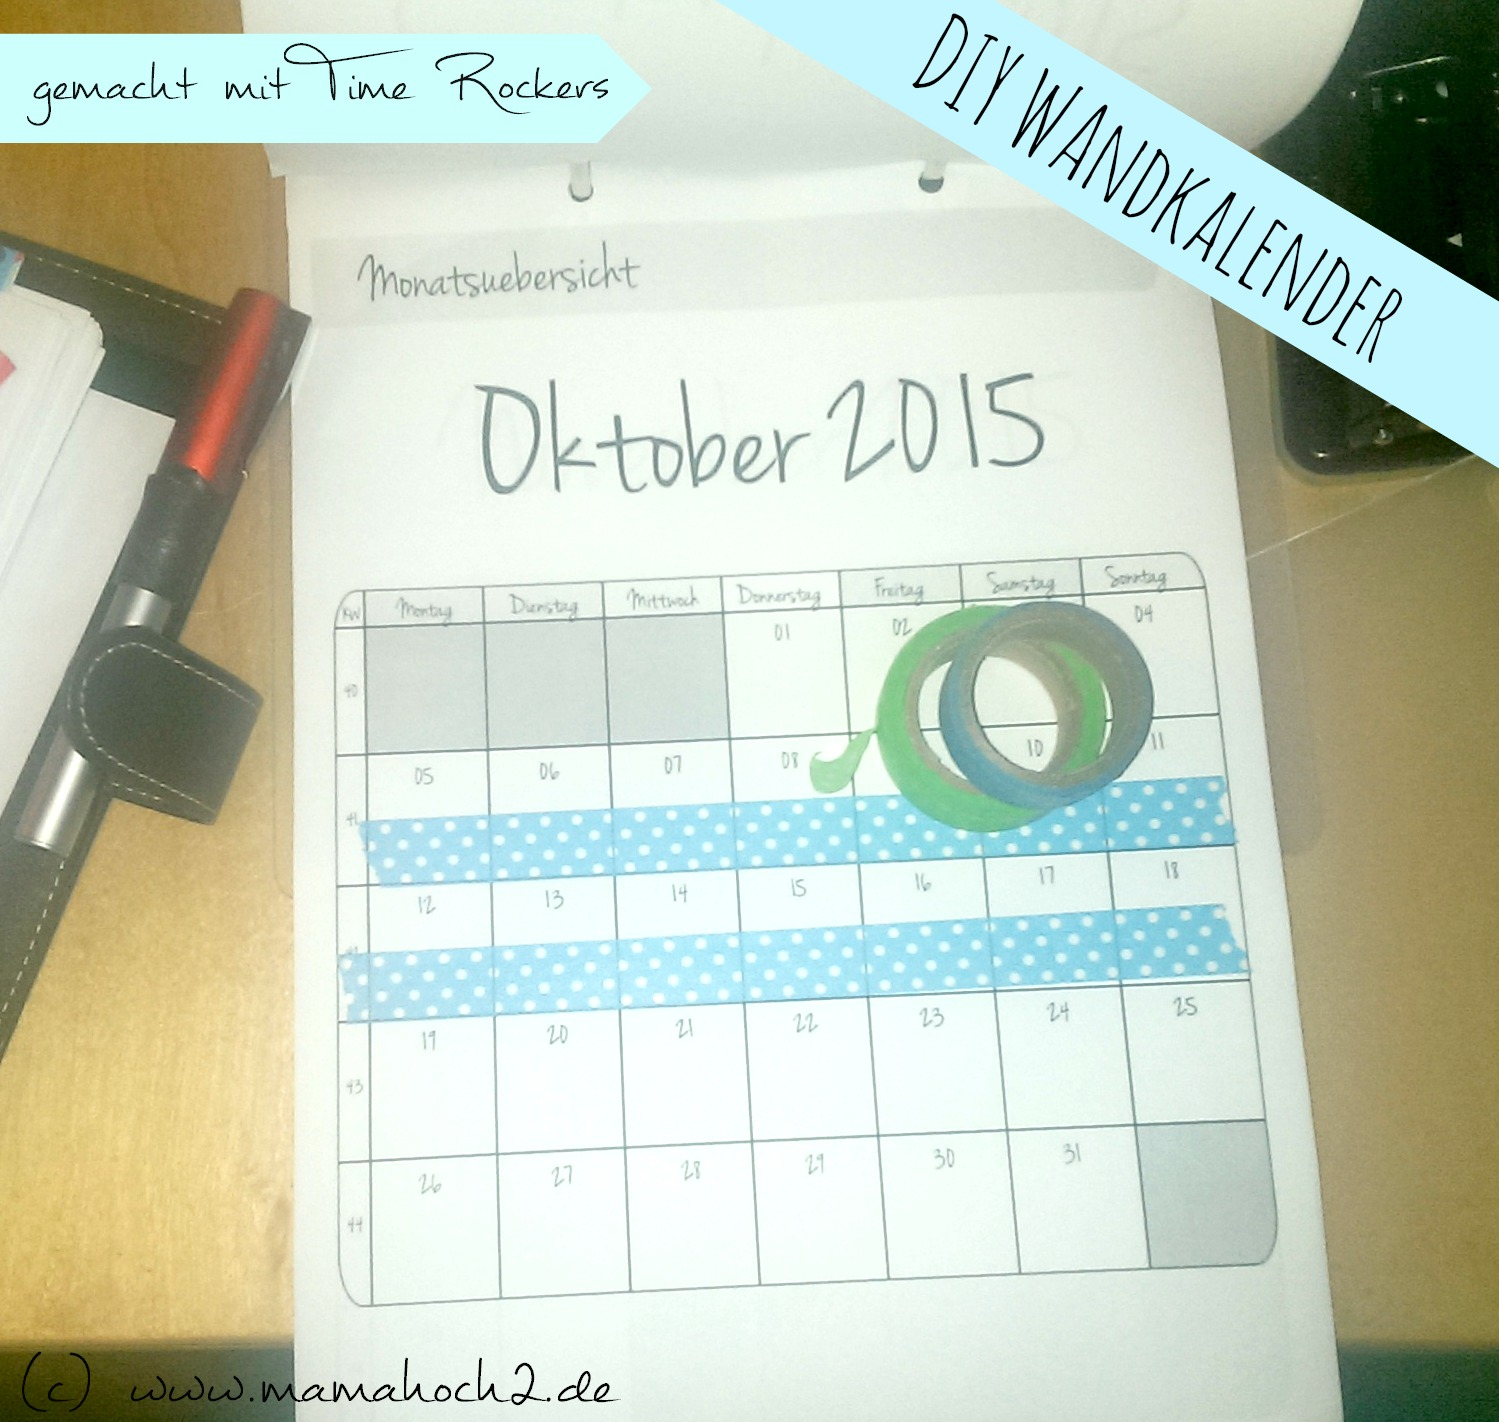 diy wandkalender